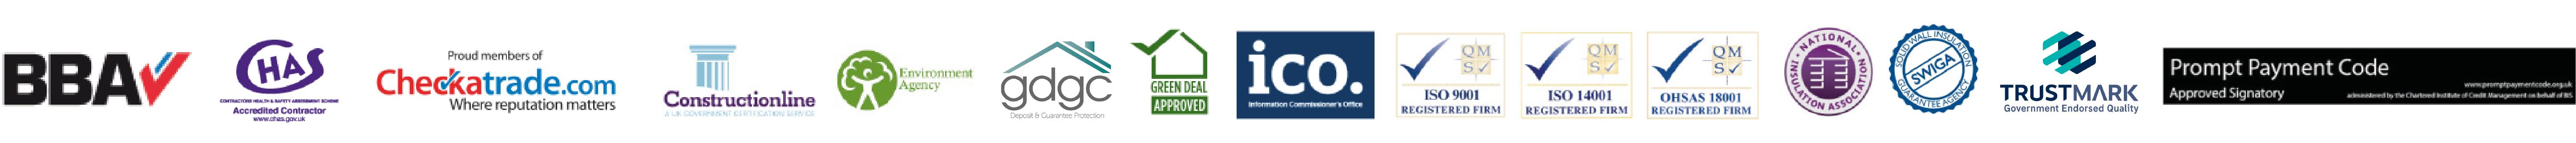 loweraccreditations_dec2018